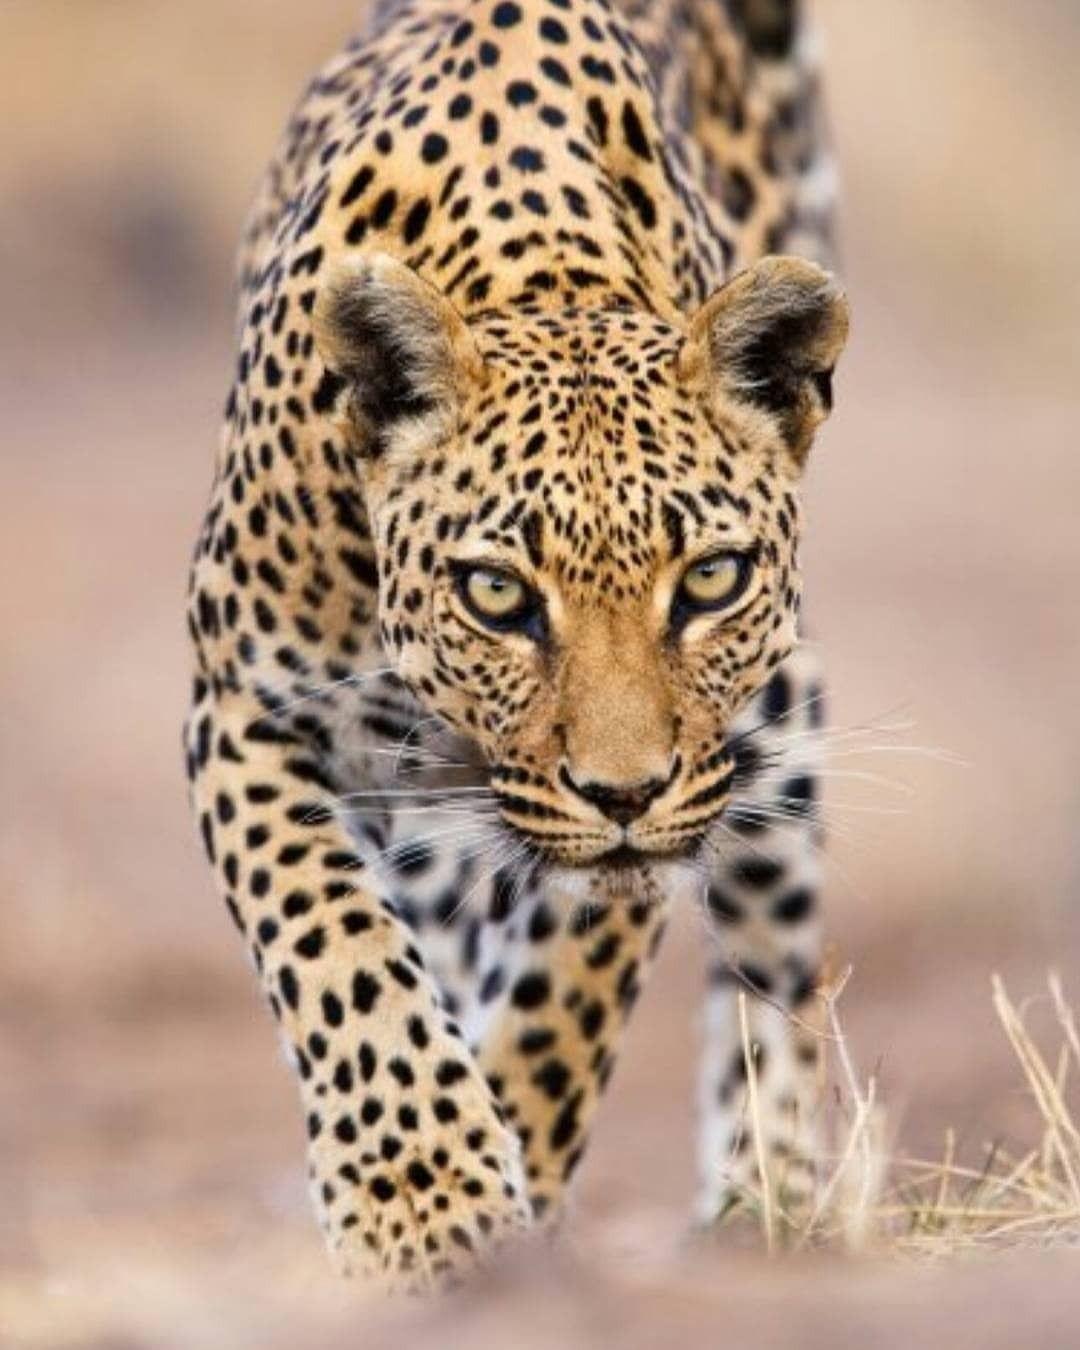 Photography By C Stephen Belcher Leopard S Piercing Eyes